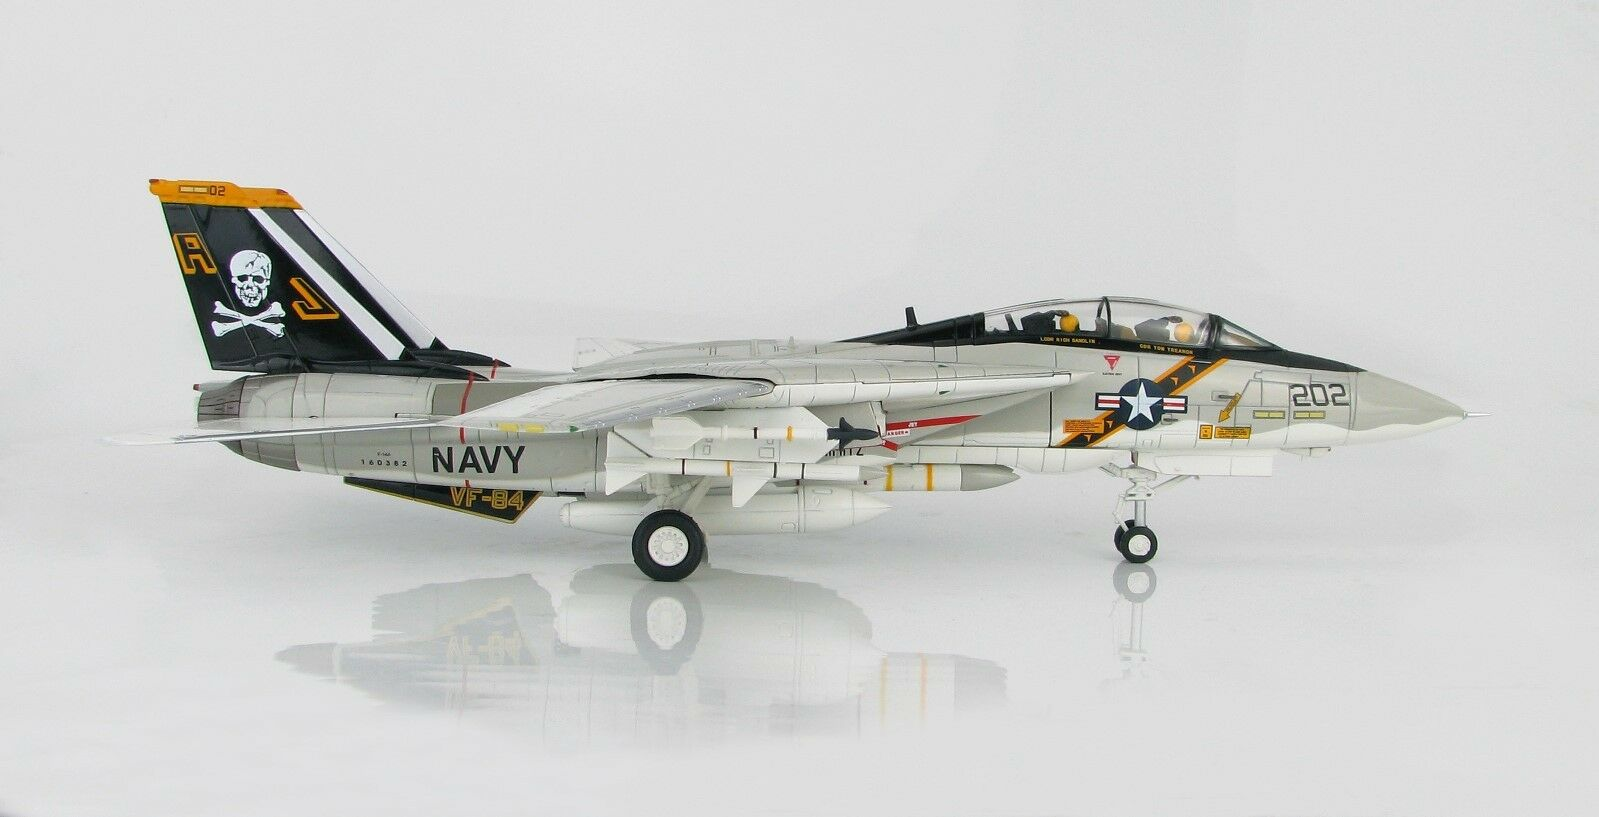 HOBBY MASTER 1 72 HA5211 GRUMMAN F-14A TOMCAT 160382 AJ 202, VF-84  JOLLY ROGERS